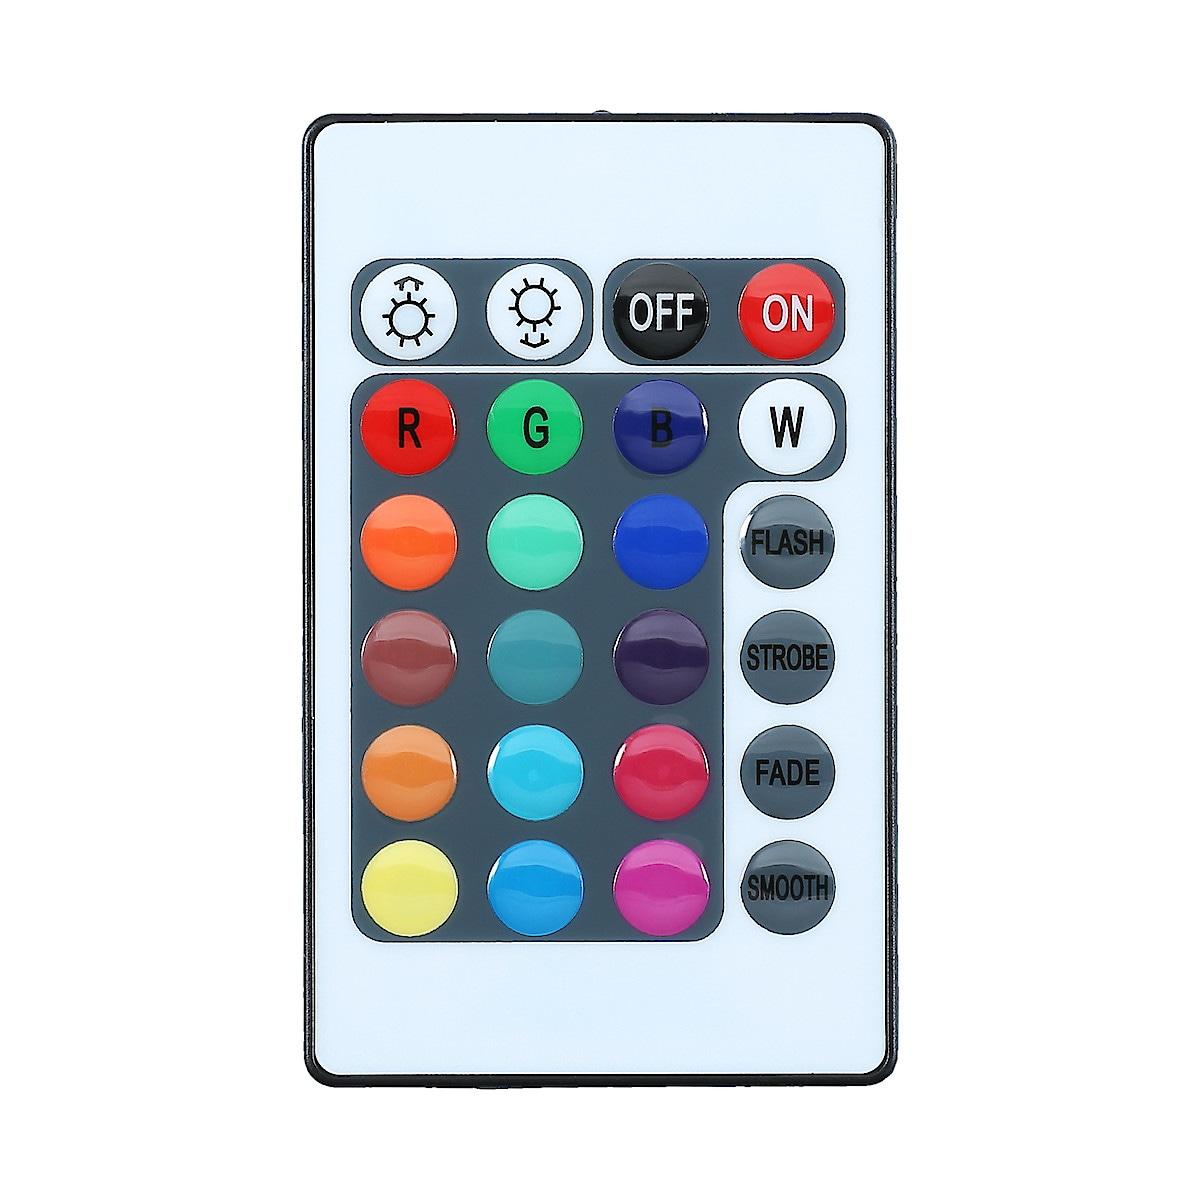 RGB LS7H01 fjernkontroll